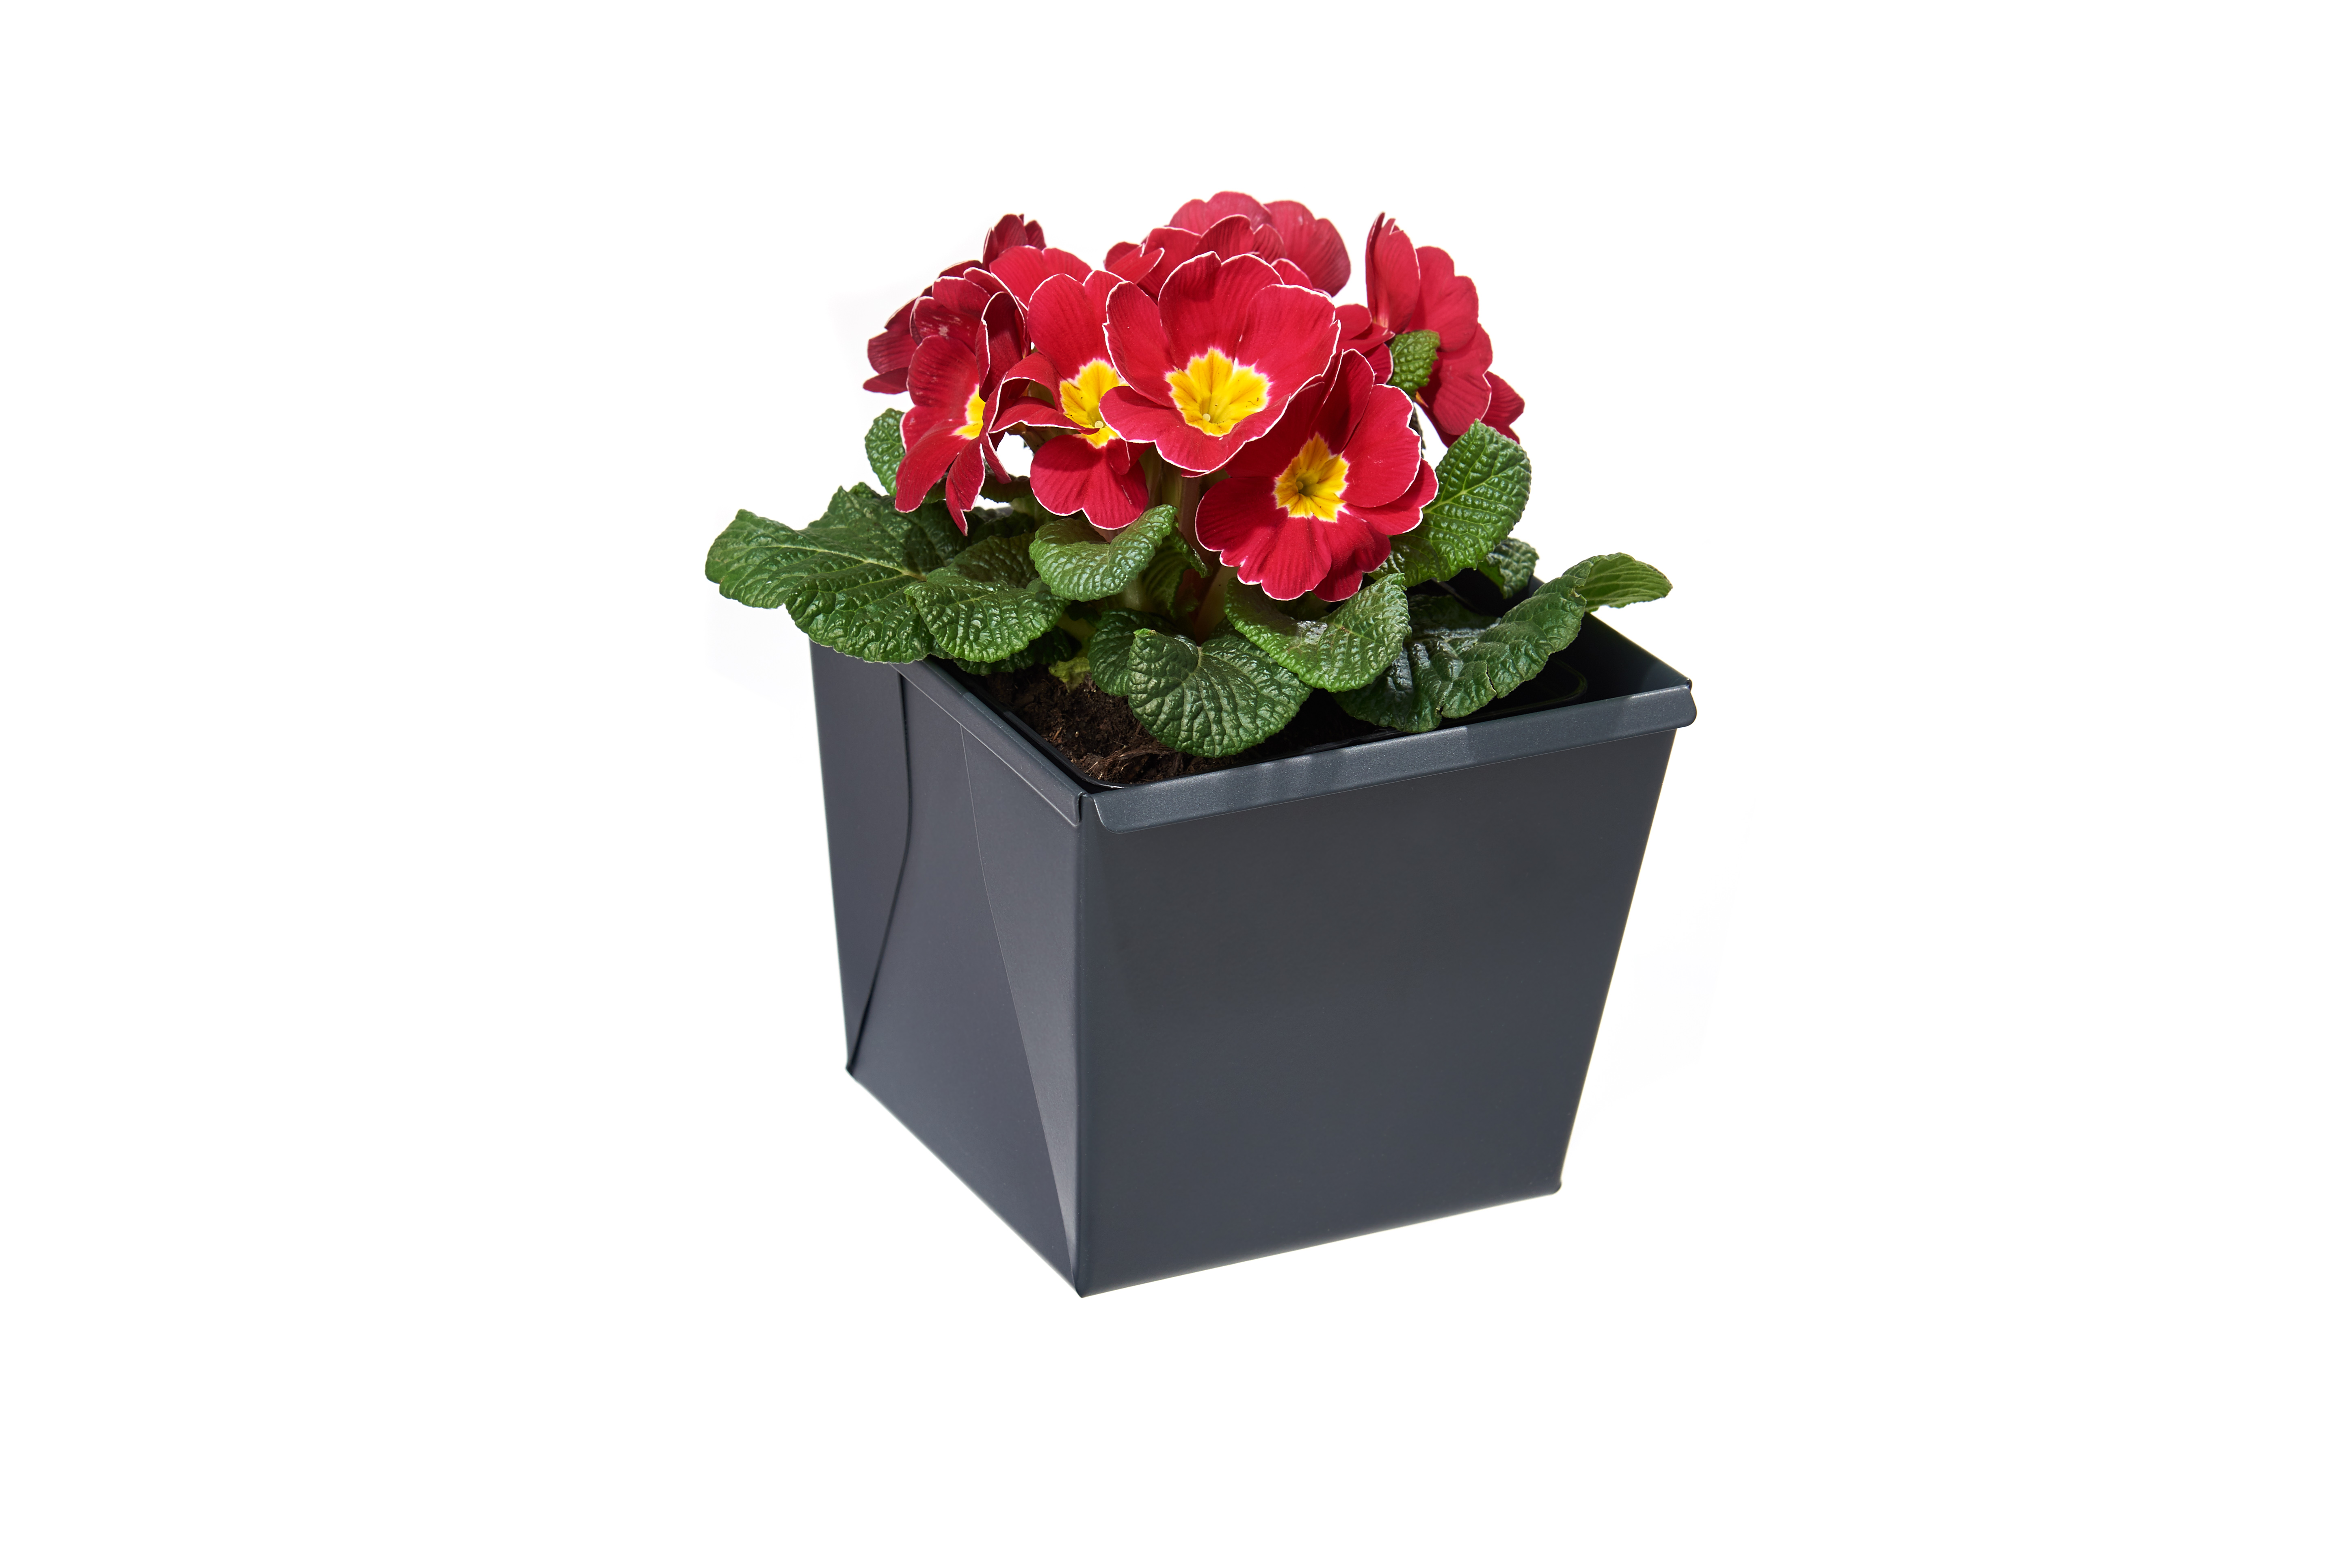 gabioka flowerbox small anthrazit pulverbeschichtet (RAL 7016 glatt matt)